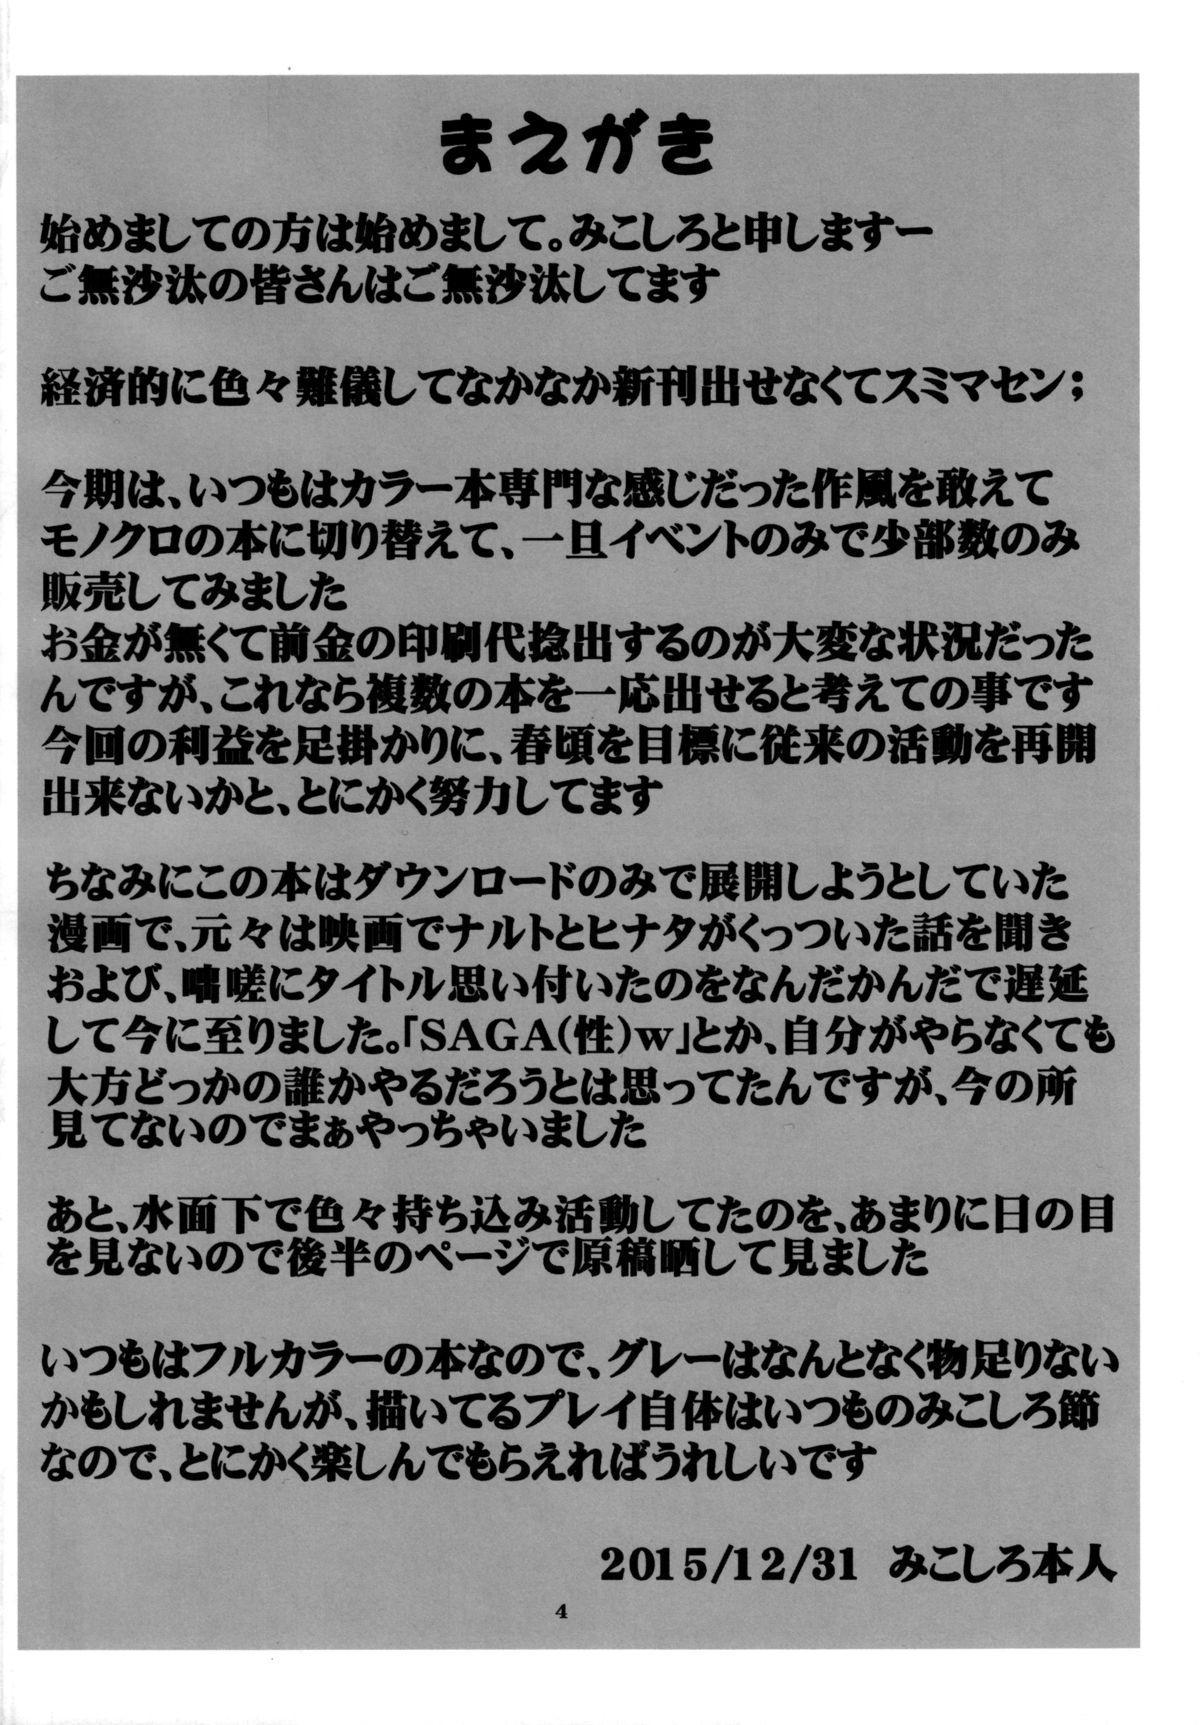 (C89) [Algolagnia (Mikoshiro Honnin)] Naruto [saga] sei (NARUTO) 3